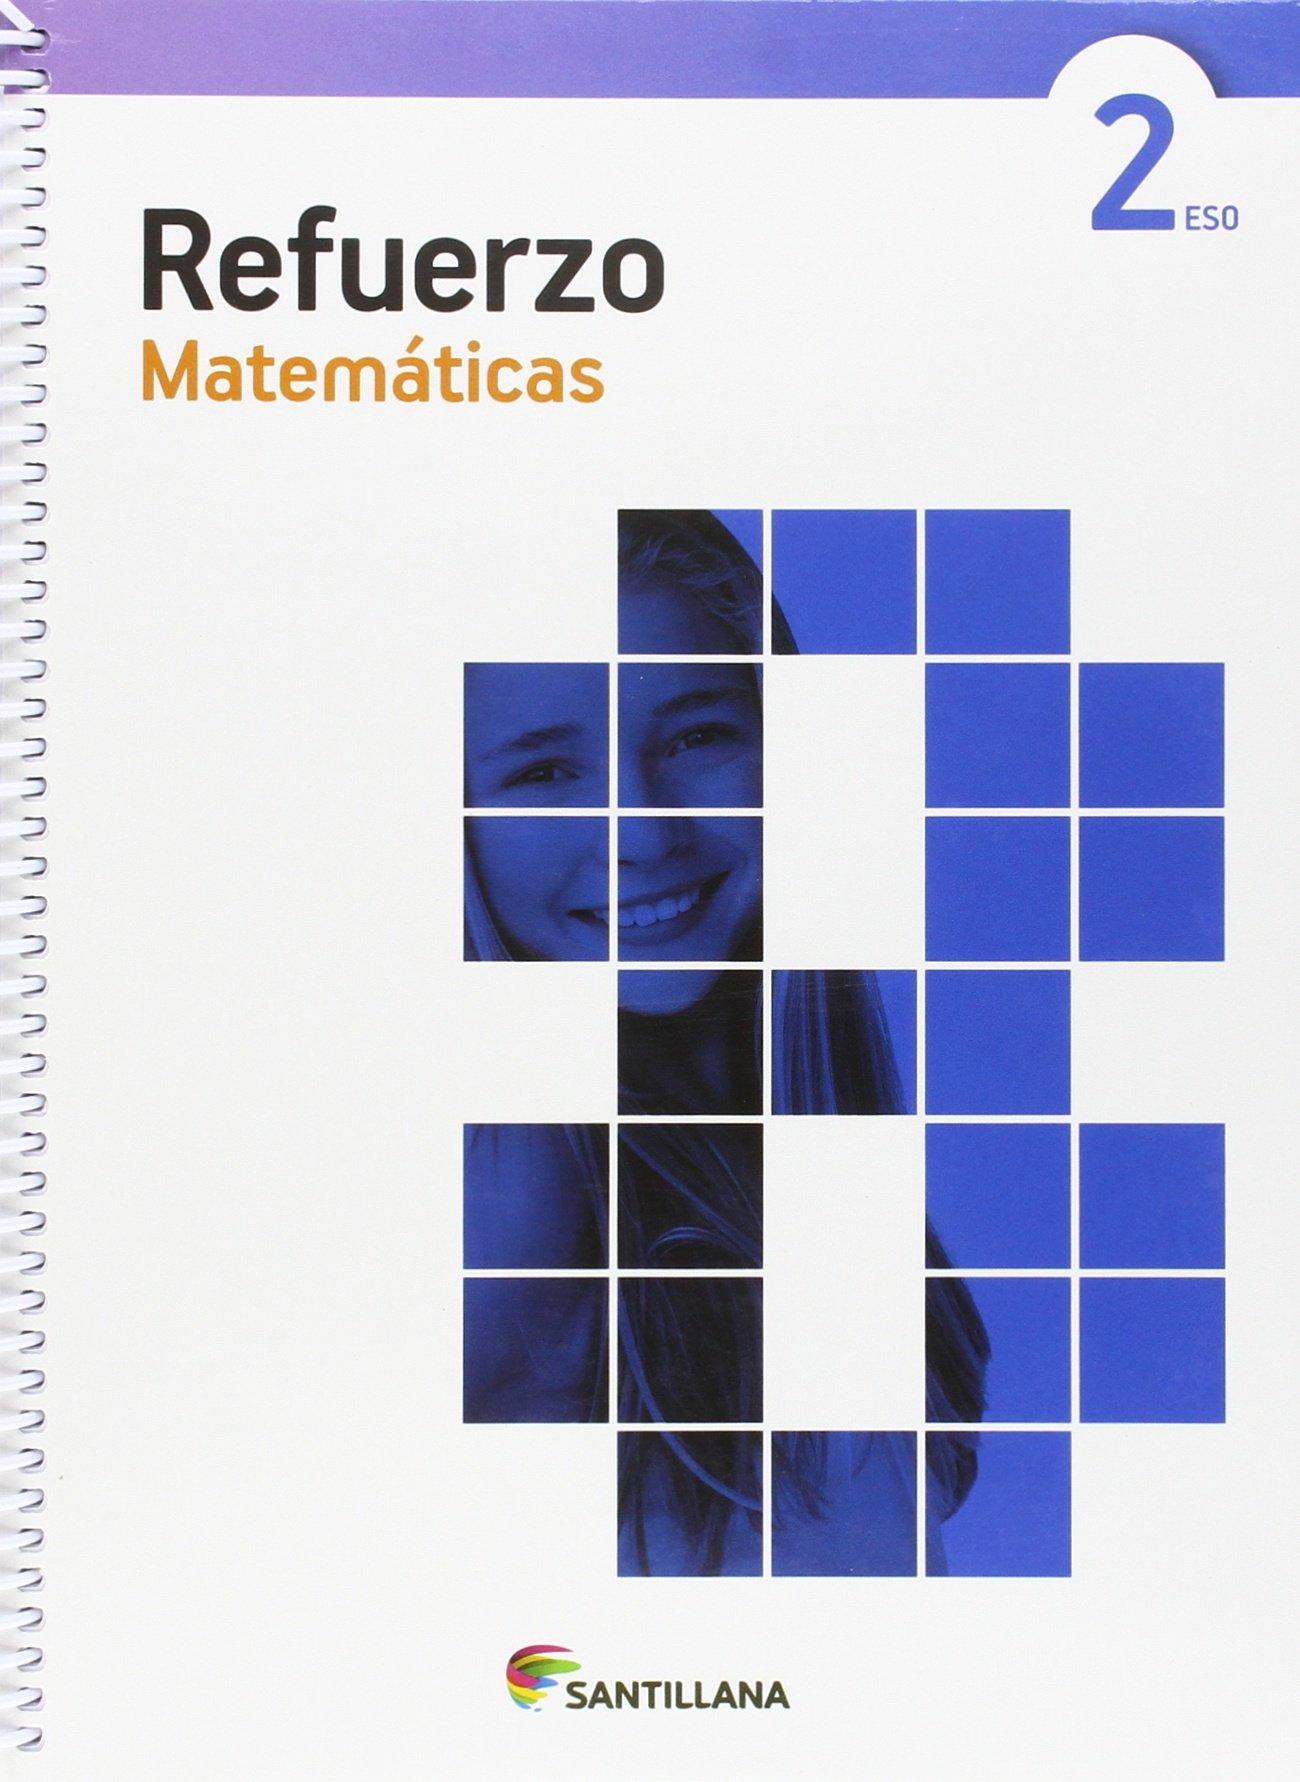 Amazon Com Cuaderno Refuerzo Matematicas 2 Eso Spanish Edition 9788468087542 Books